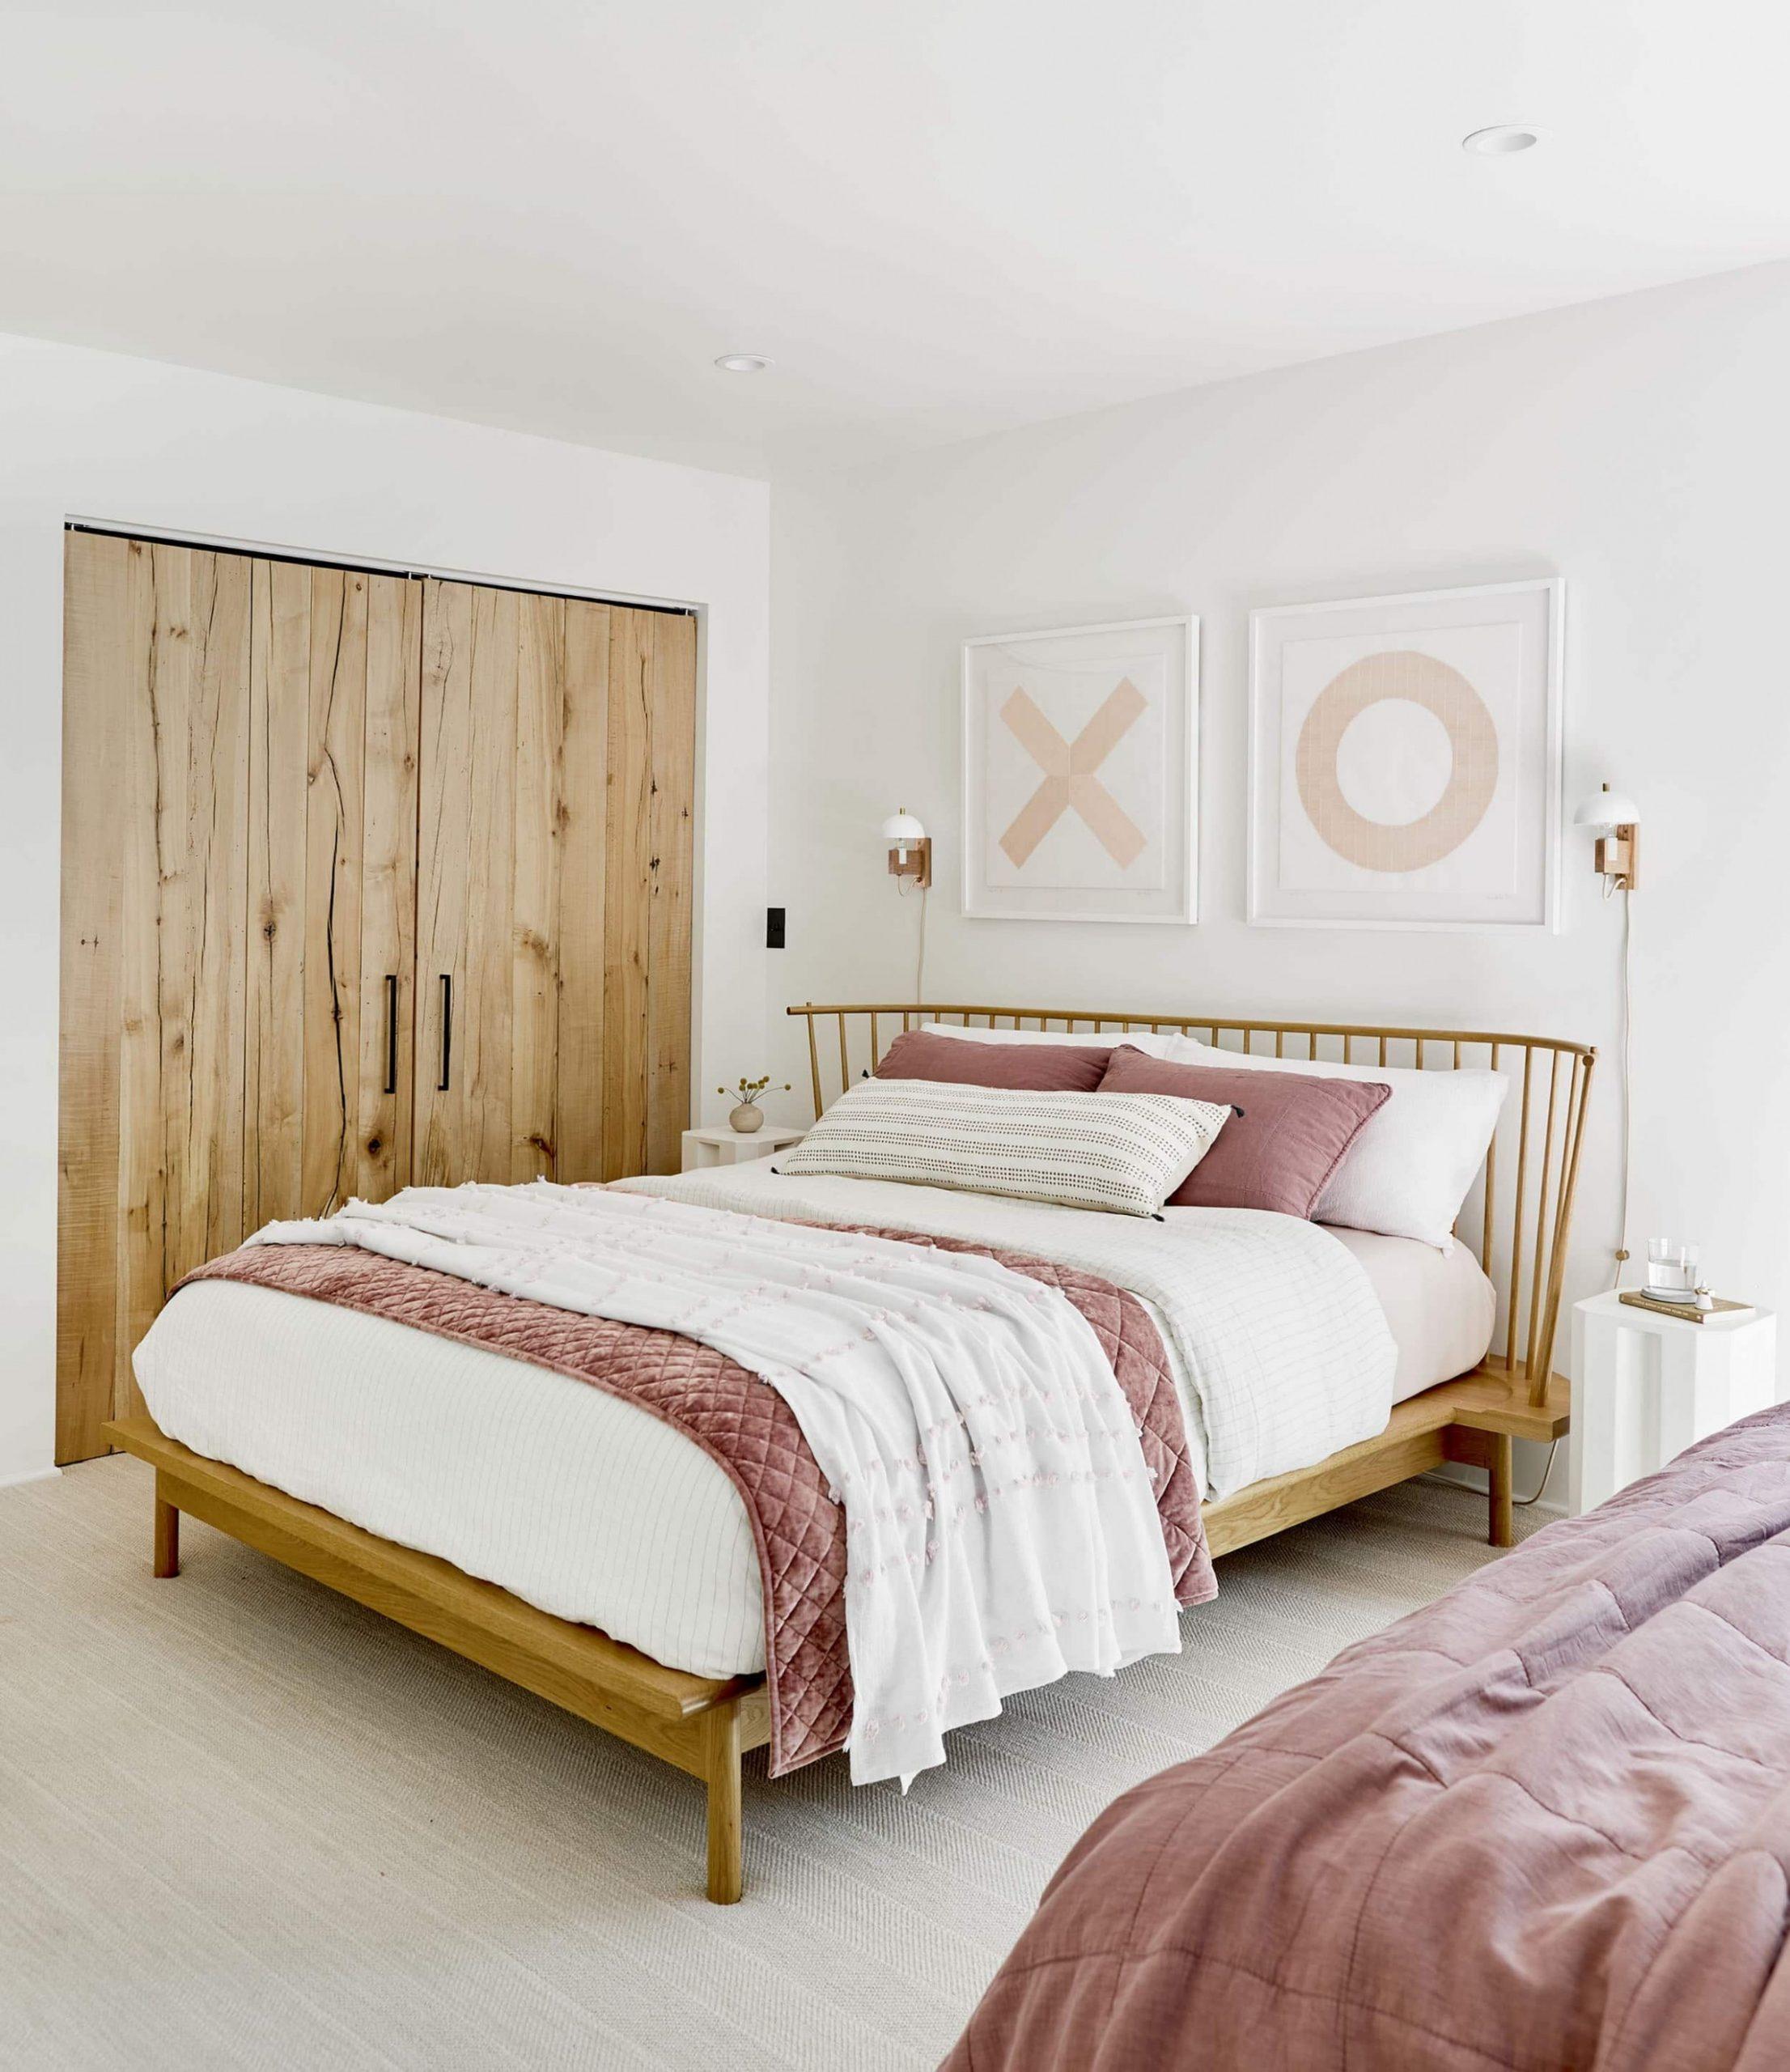 10 Best Romantic Bedroom Ideas - Romantic Decorating Ideas for Couples - Bedroom Ideas Romantic